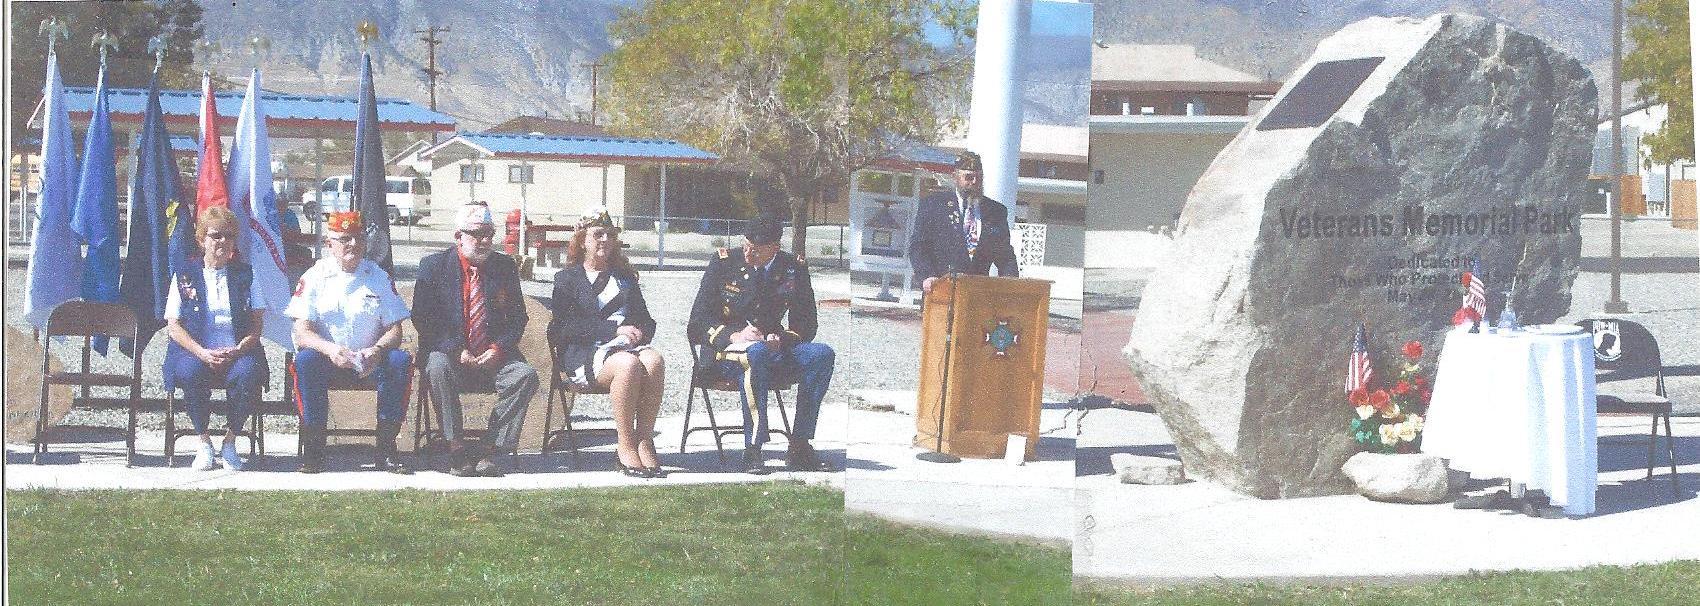 POW/MIA honored at Veterans Park